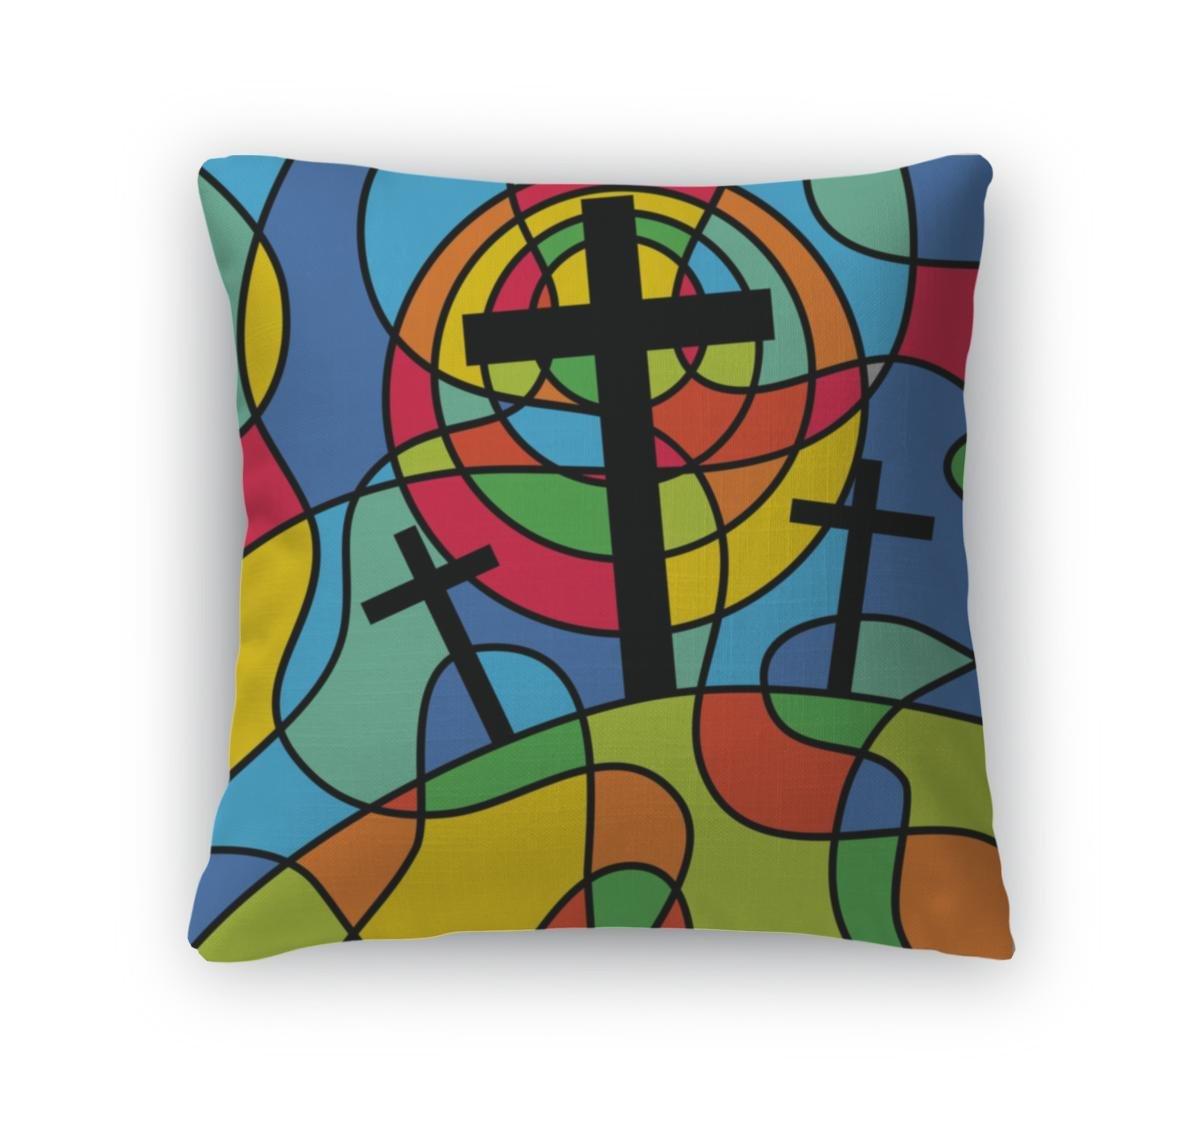 Gear New Throw Pillow Accent Decor, Christian Calvary Cross Scene, 20'' Cover & Insert, 4413052GN